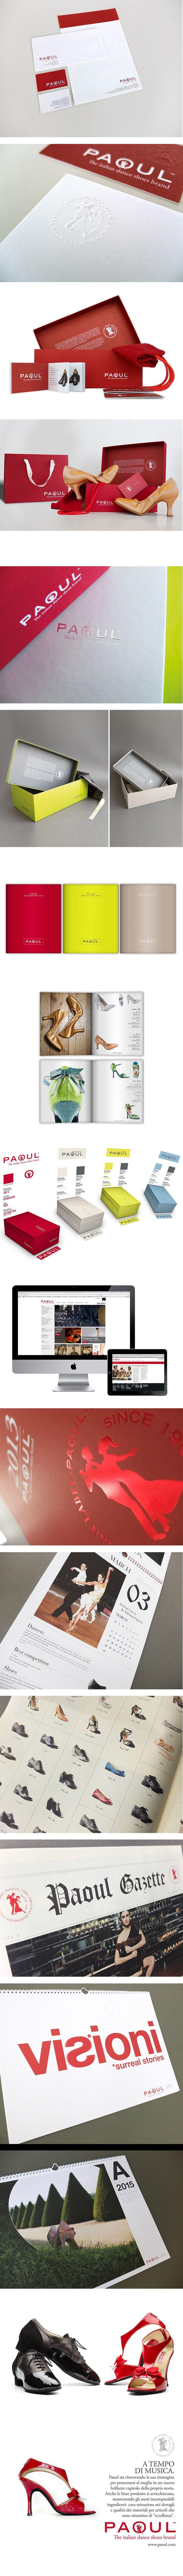 Brand Identity Calzaturificio Paoul, un progetto #effADV - Paoul #brandidentity, effADV project - #branding #corporate #identity #identitybranding #leaflet #photography #labels #packaging #shoes #catalogue #houseorgan #calendar #bag #shopper